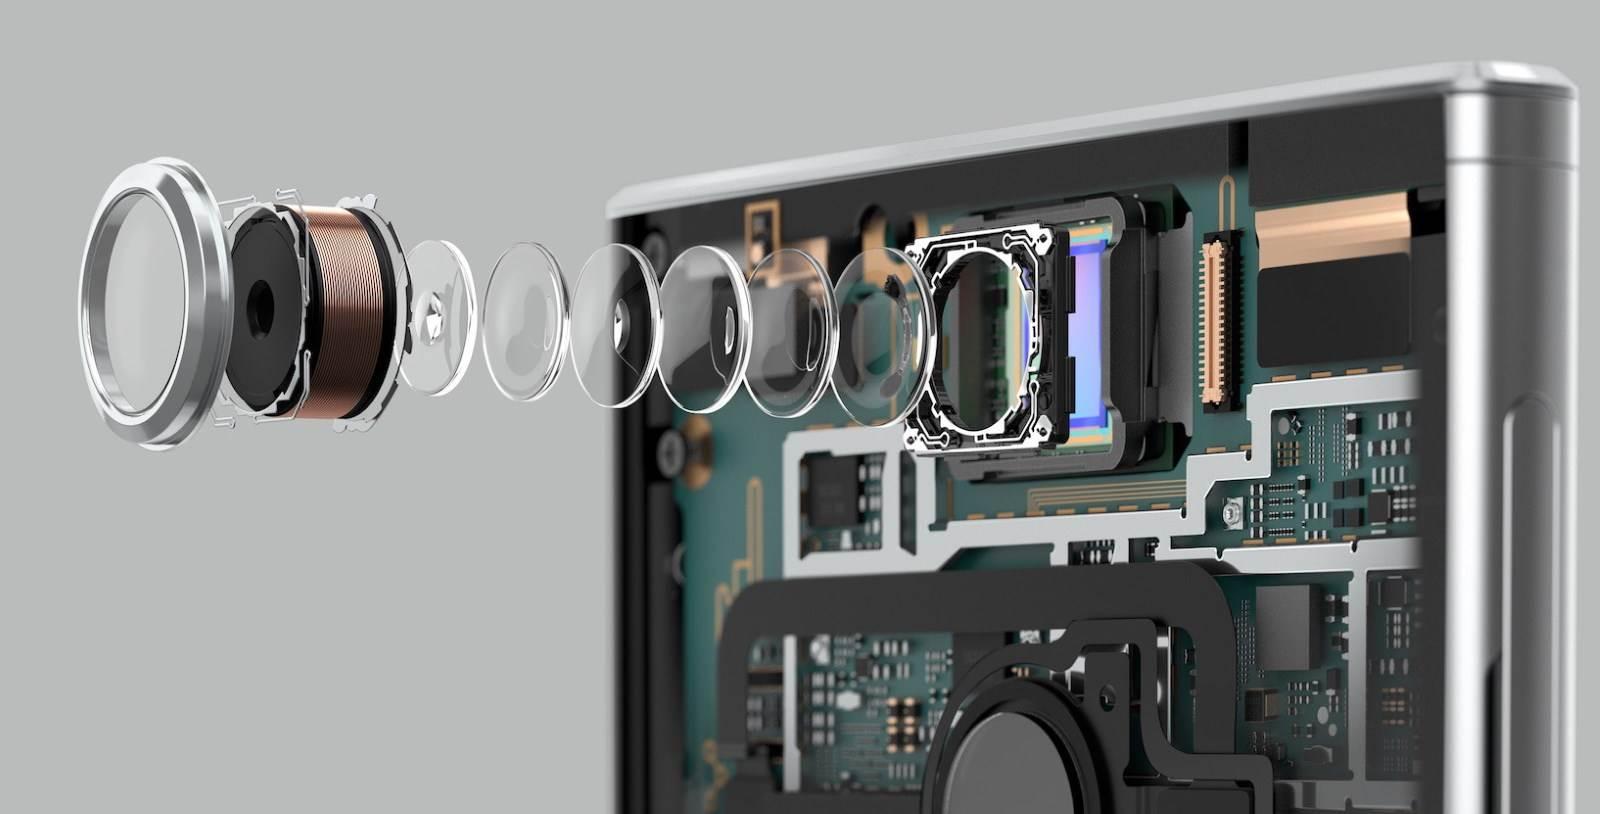 Senzor kamere